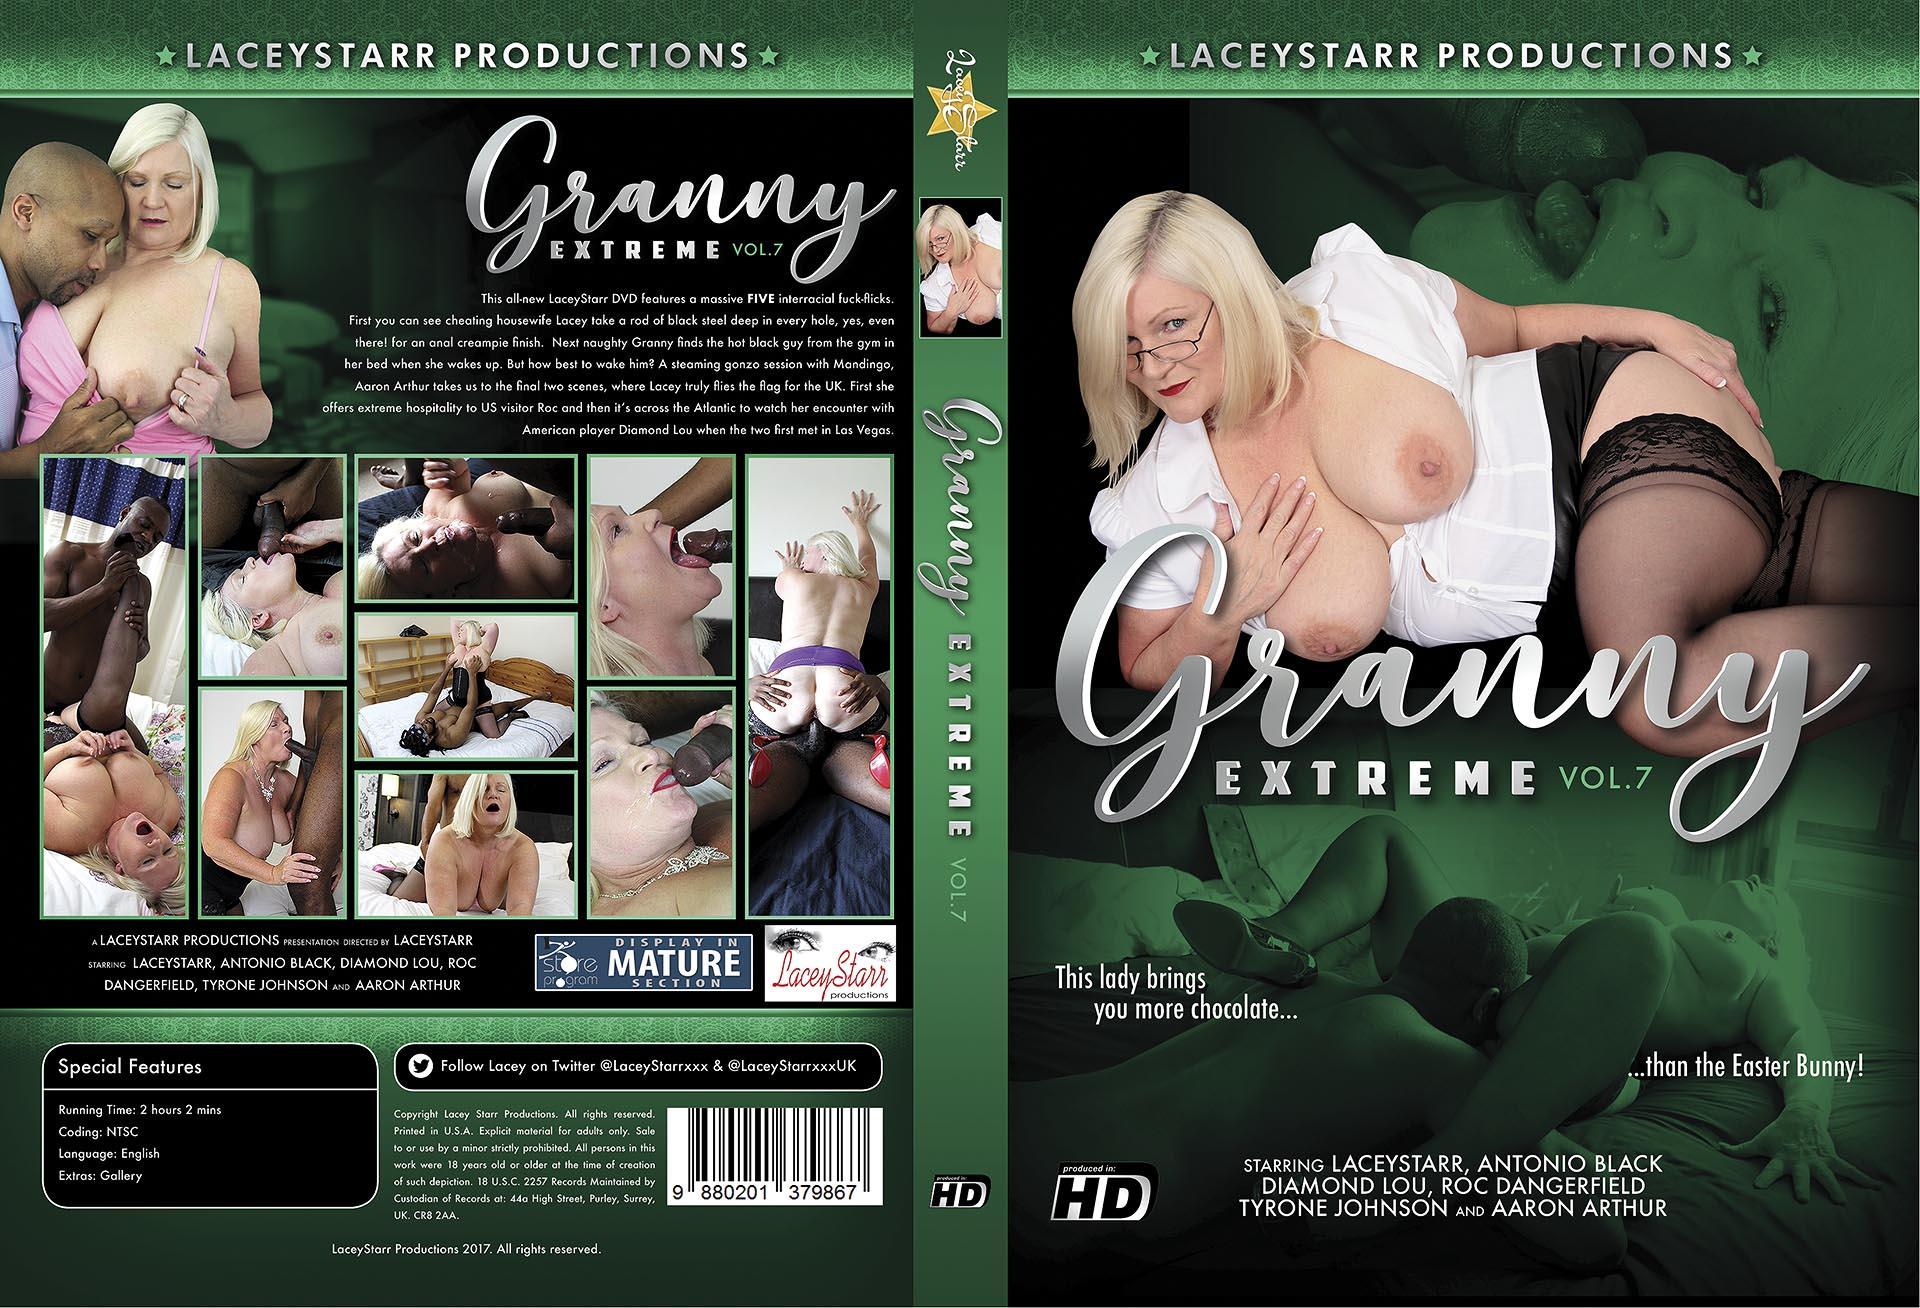 LS_GrannyExtreme_Volume7_UK_Sleeve_Large.jpg